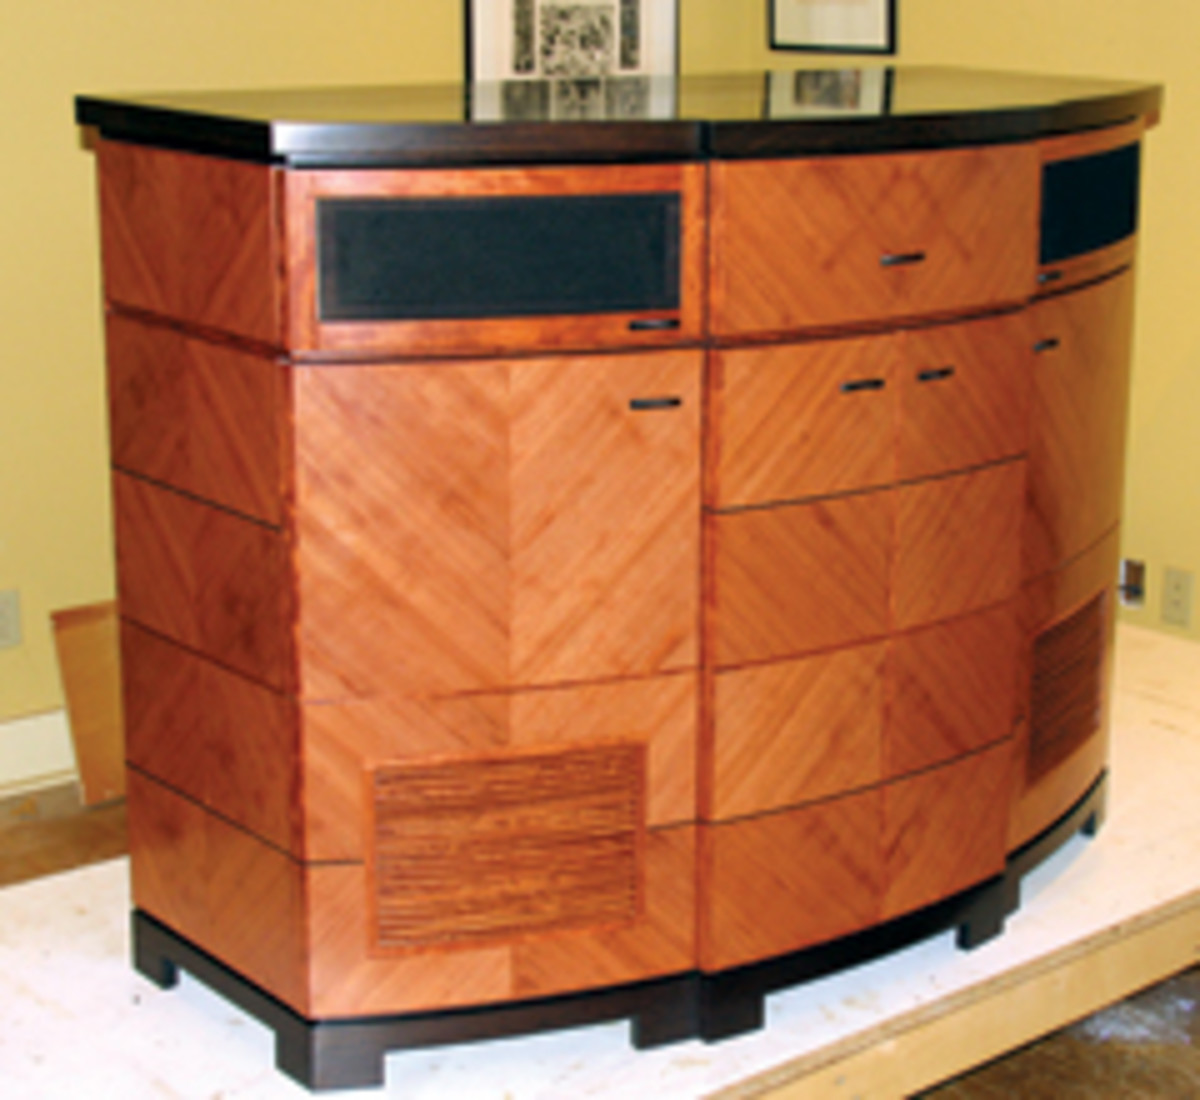 St. John built this audio cabinet with quartered bubinga veneer, wenge veneer and solid lumber.